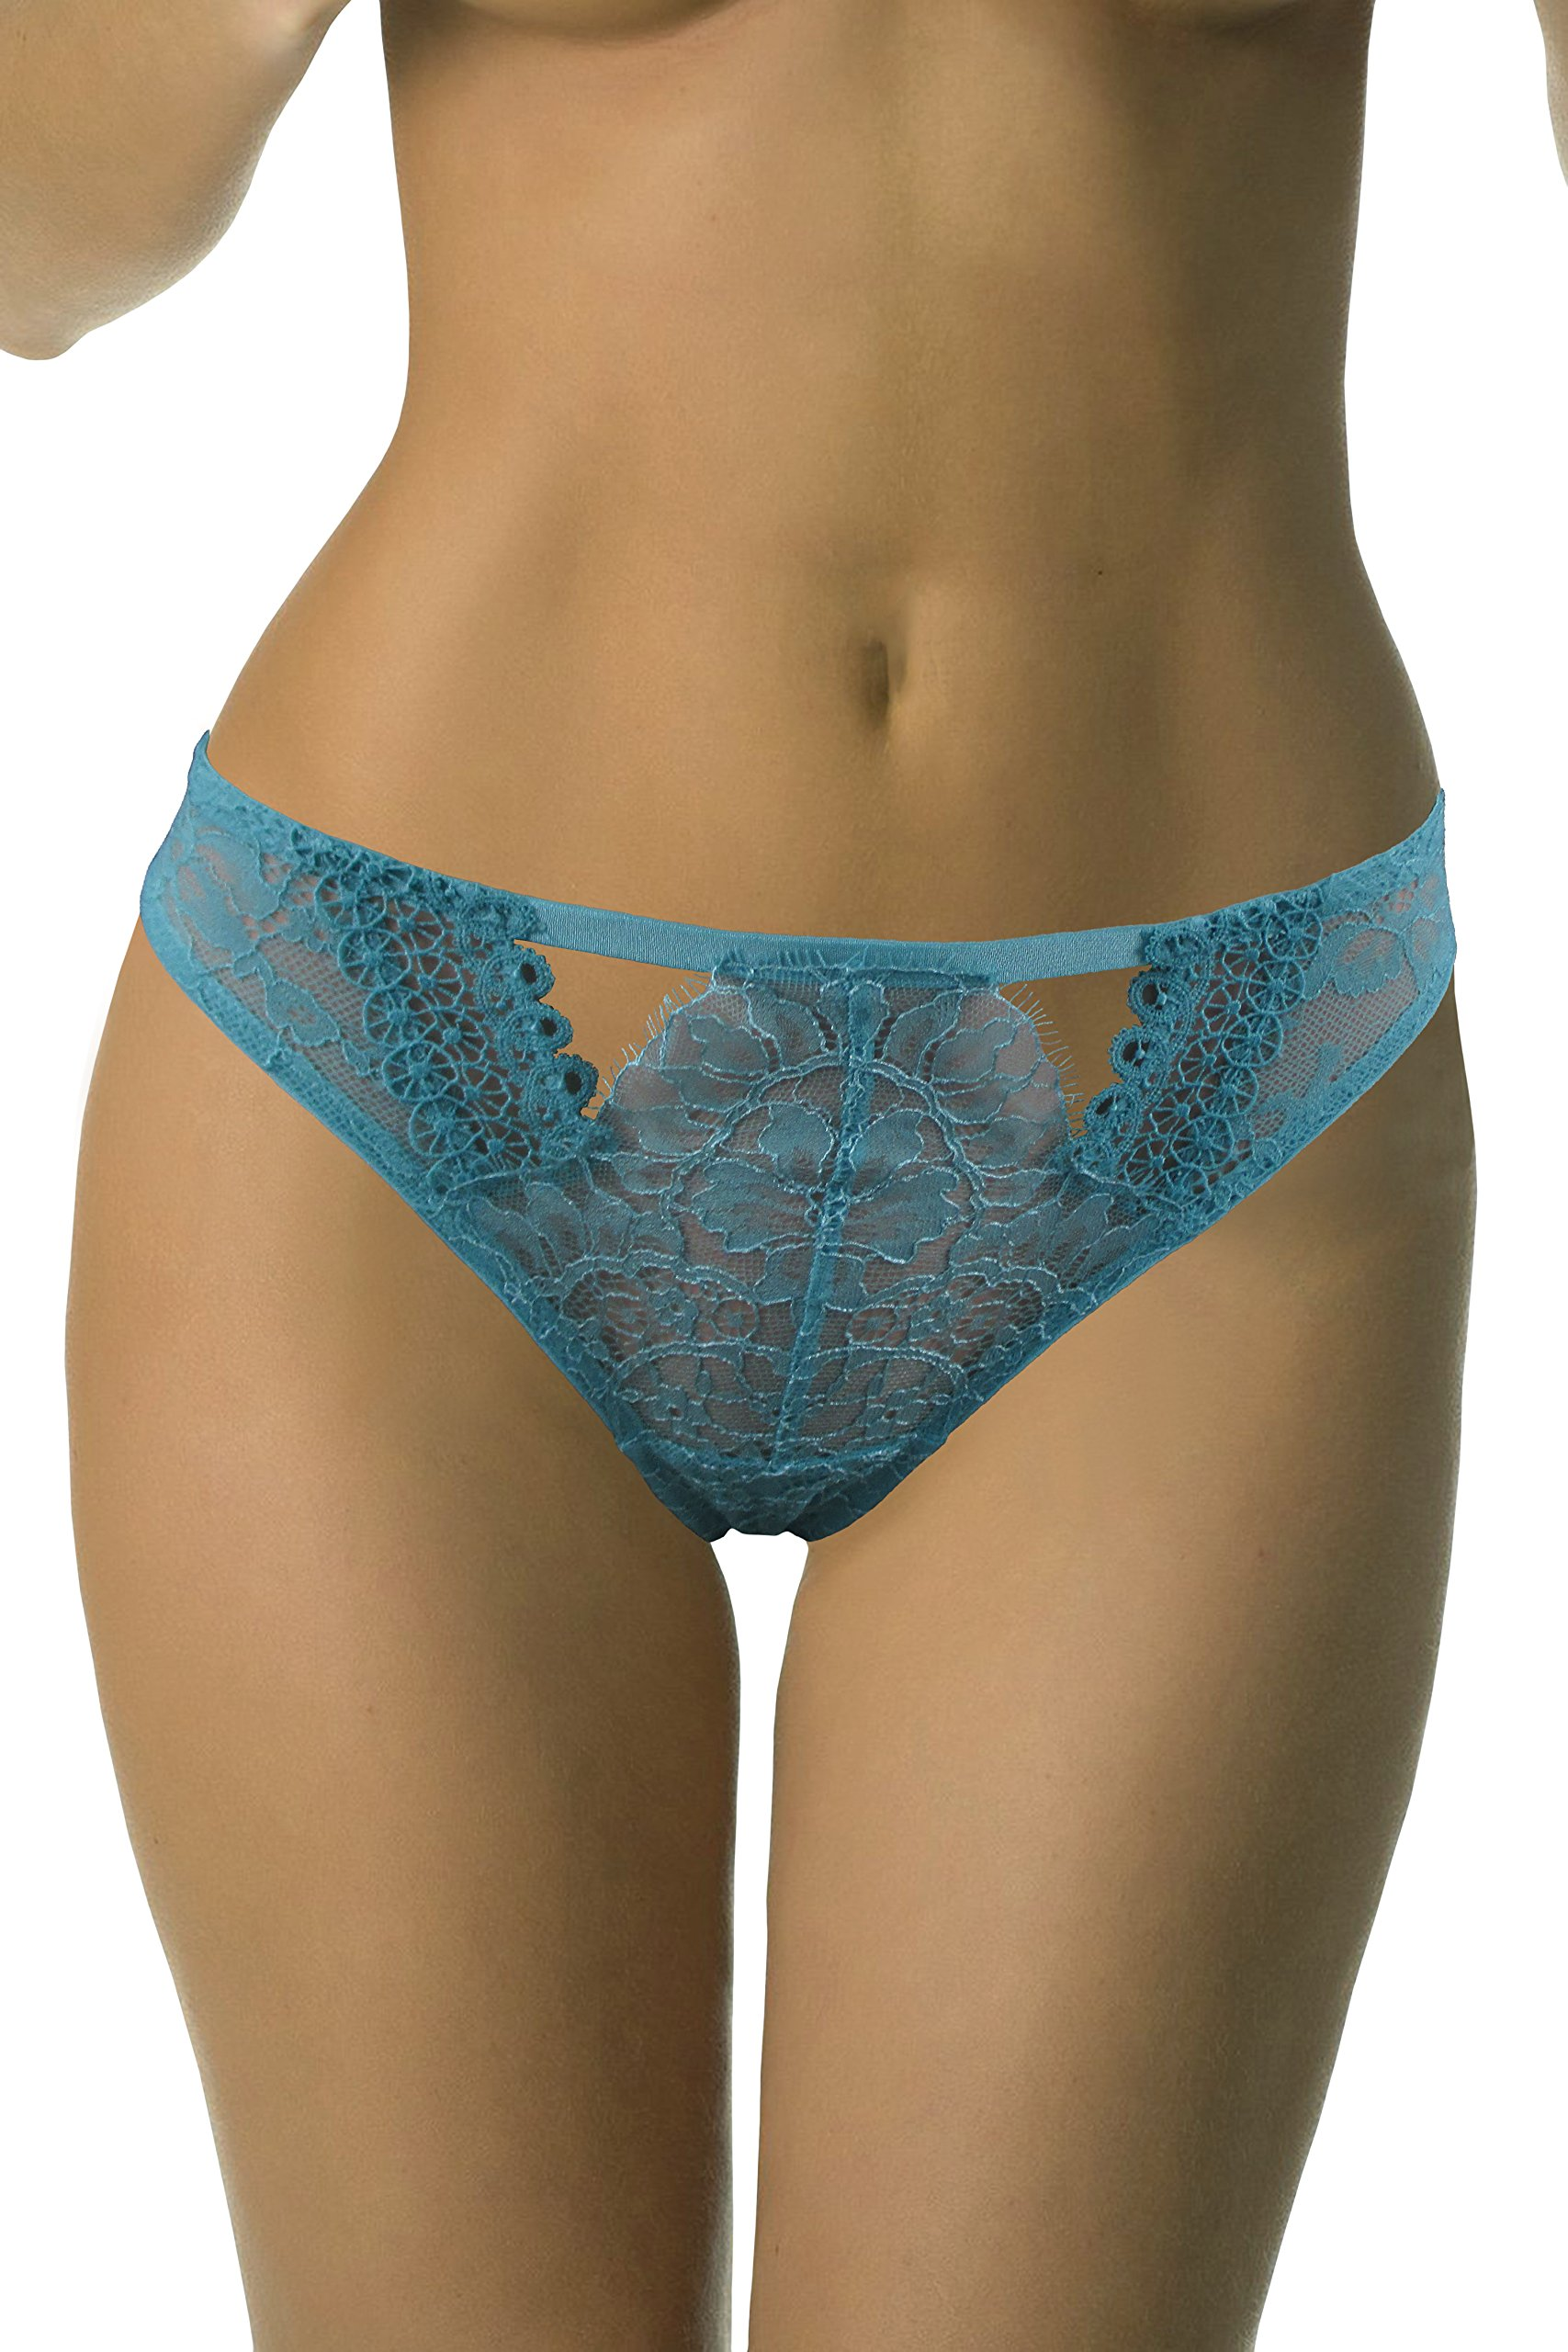 Victorias Secret Sexy Blue Lace & Mesh Cheekini Small